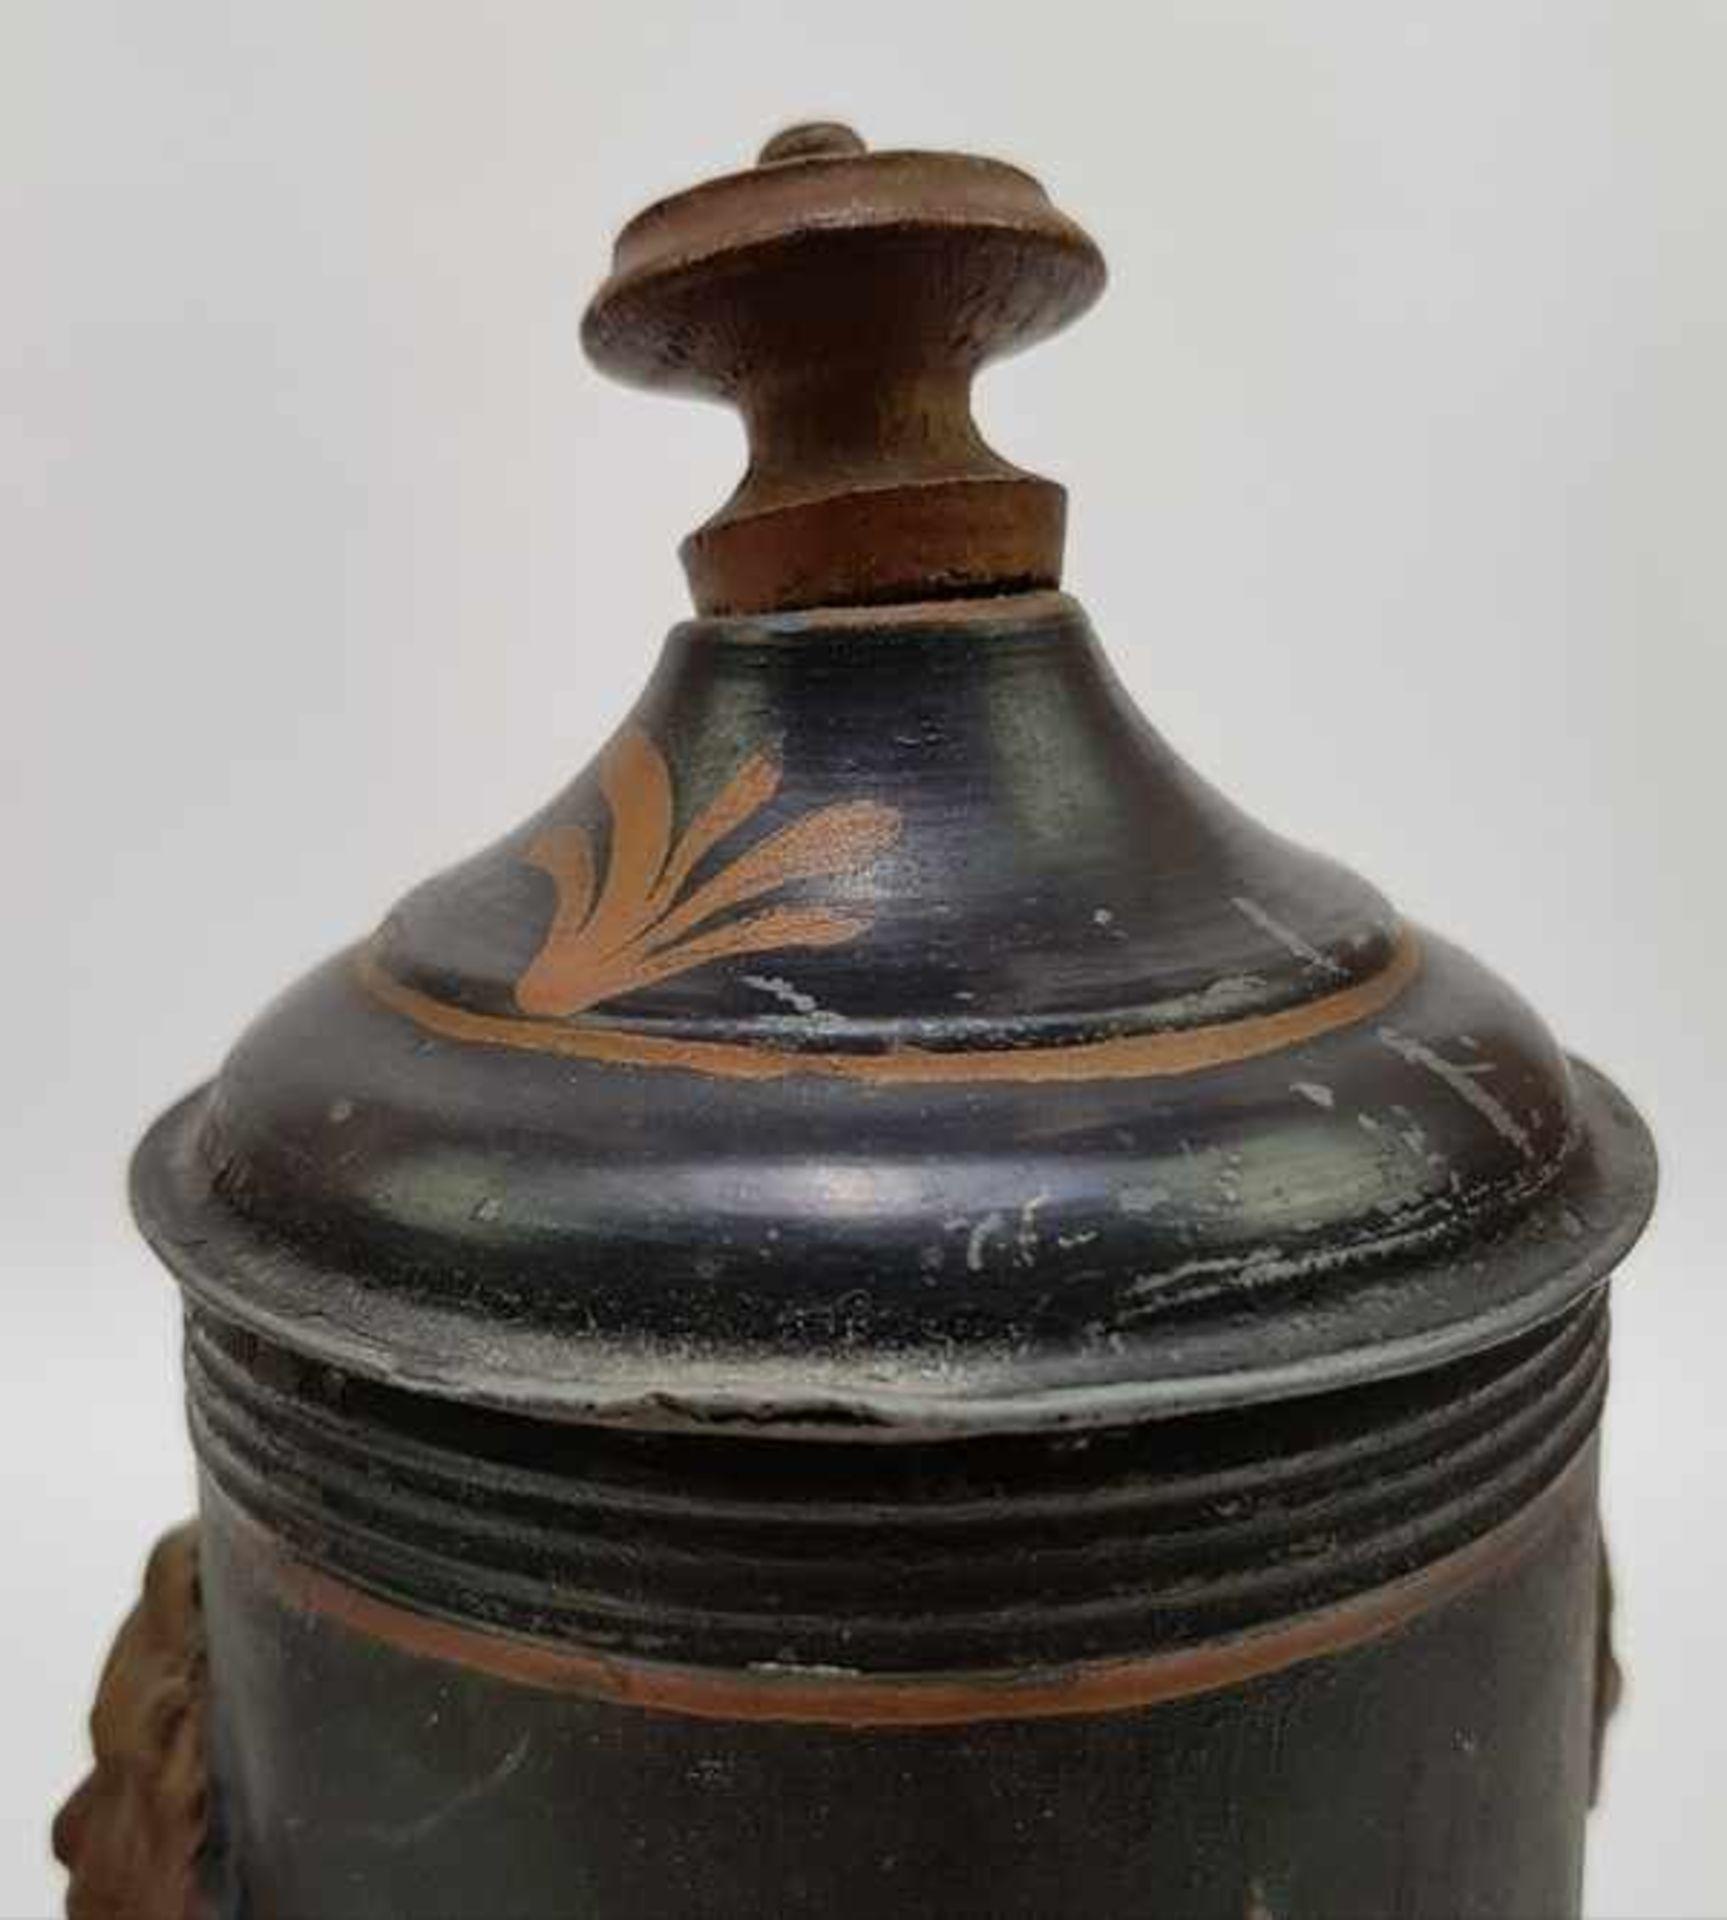 Los 166 - (Antiek) Blikken kraantjespot, theebus en dienblad